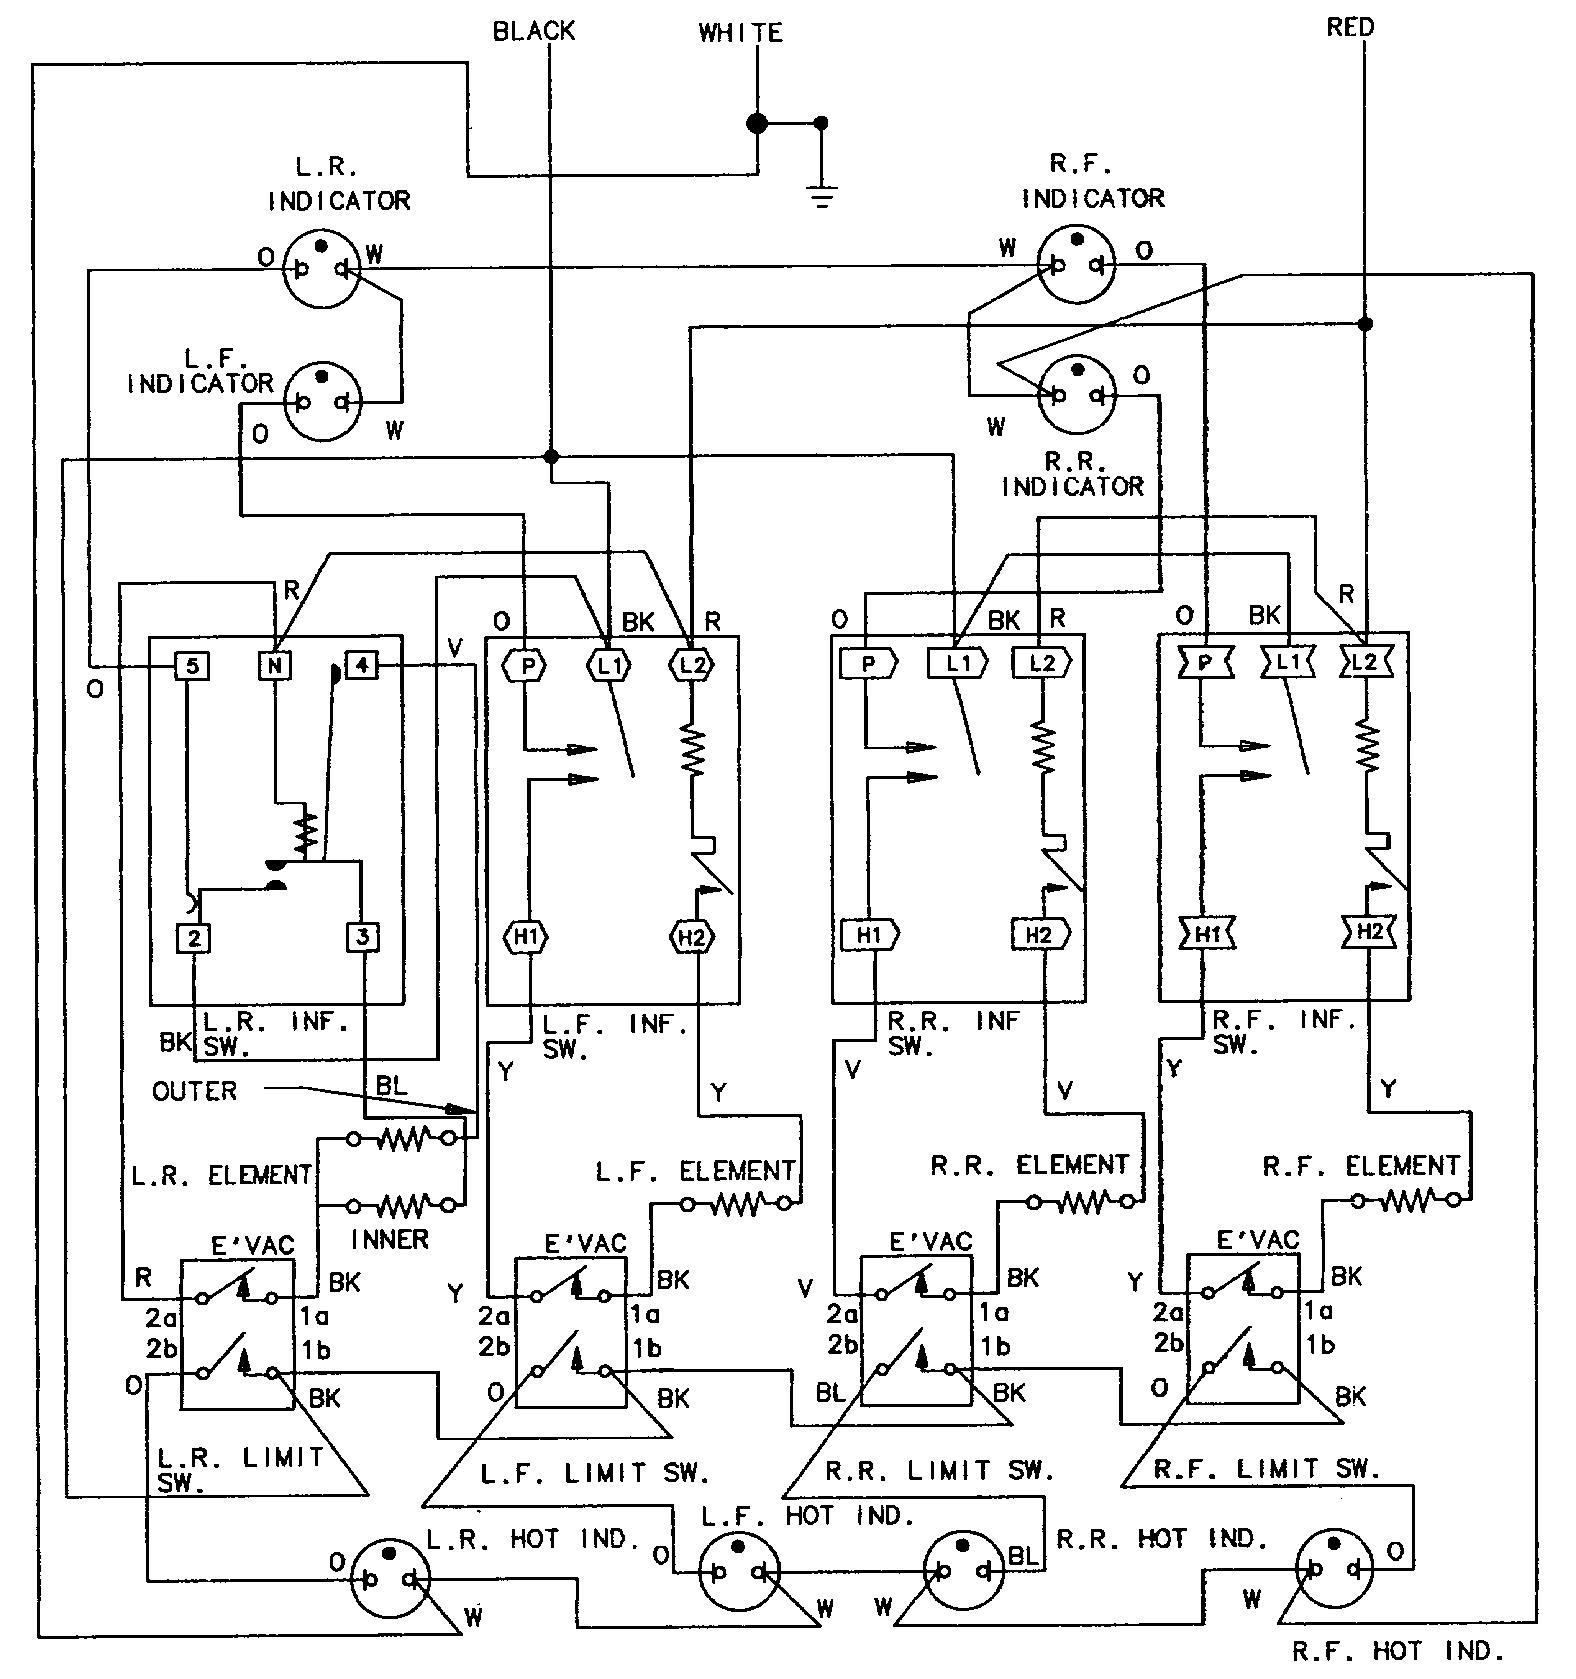 medium resolution of jenn air wiring diagram jenn air wiring diagram wiring diagram megajenn air wiring diagram wiring diagram